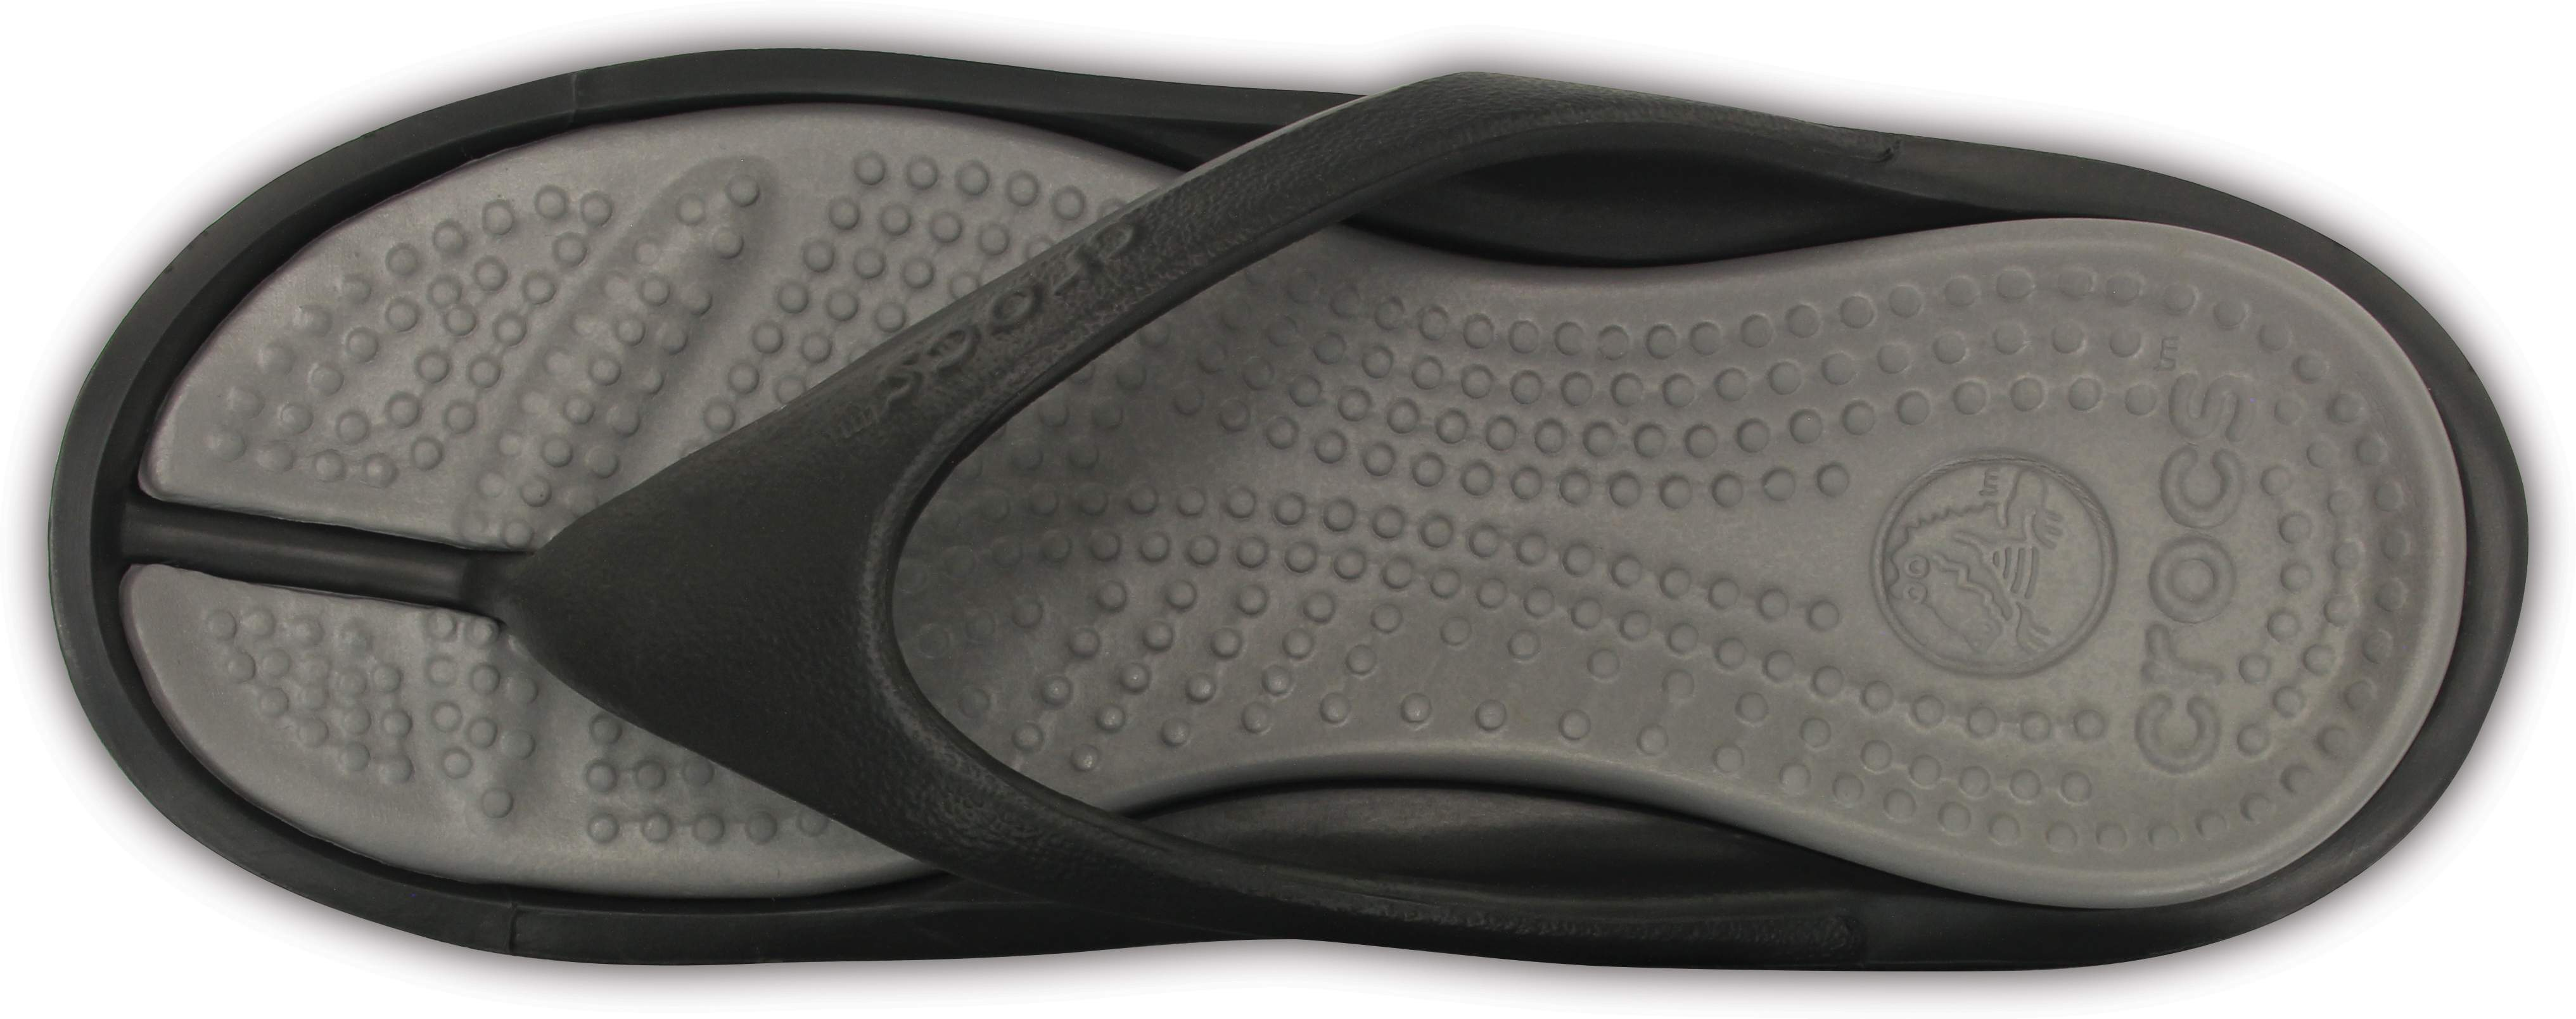 Mens Crocs Flip Flops Sandals Athens Black Gray 10024-05M